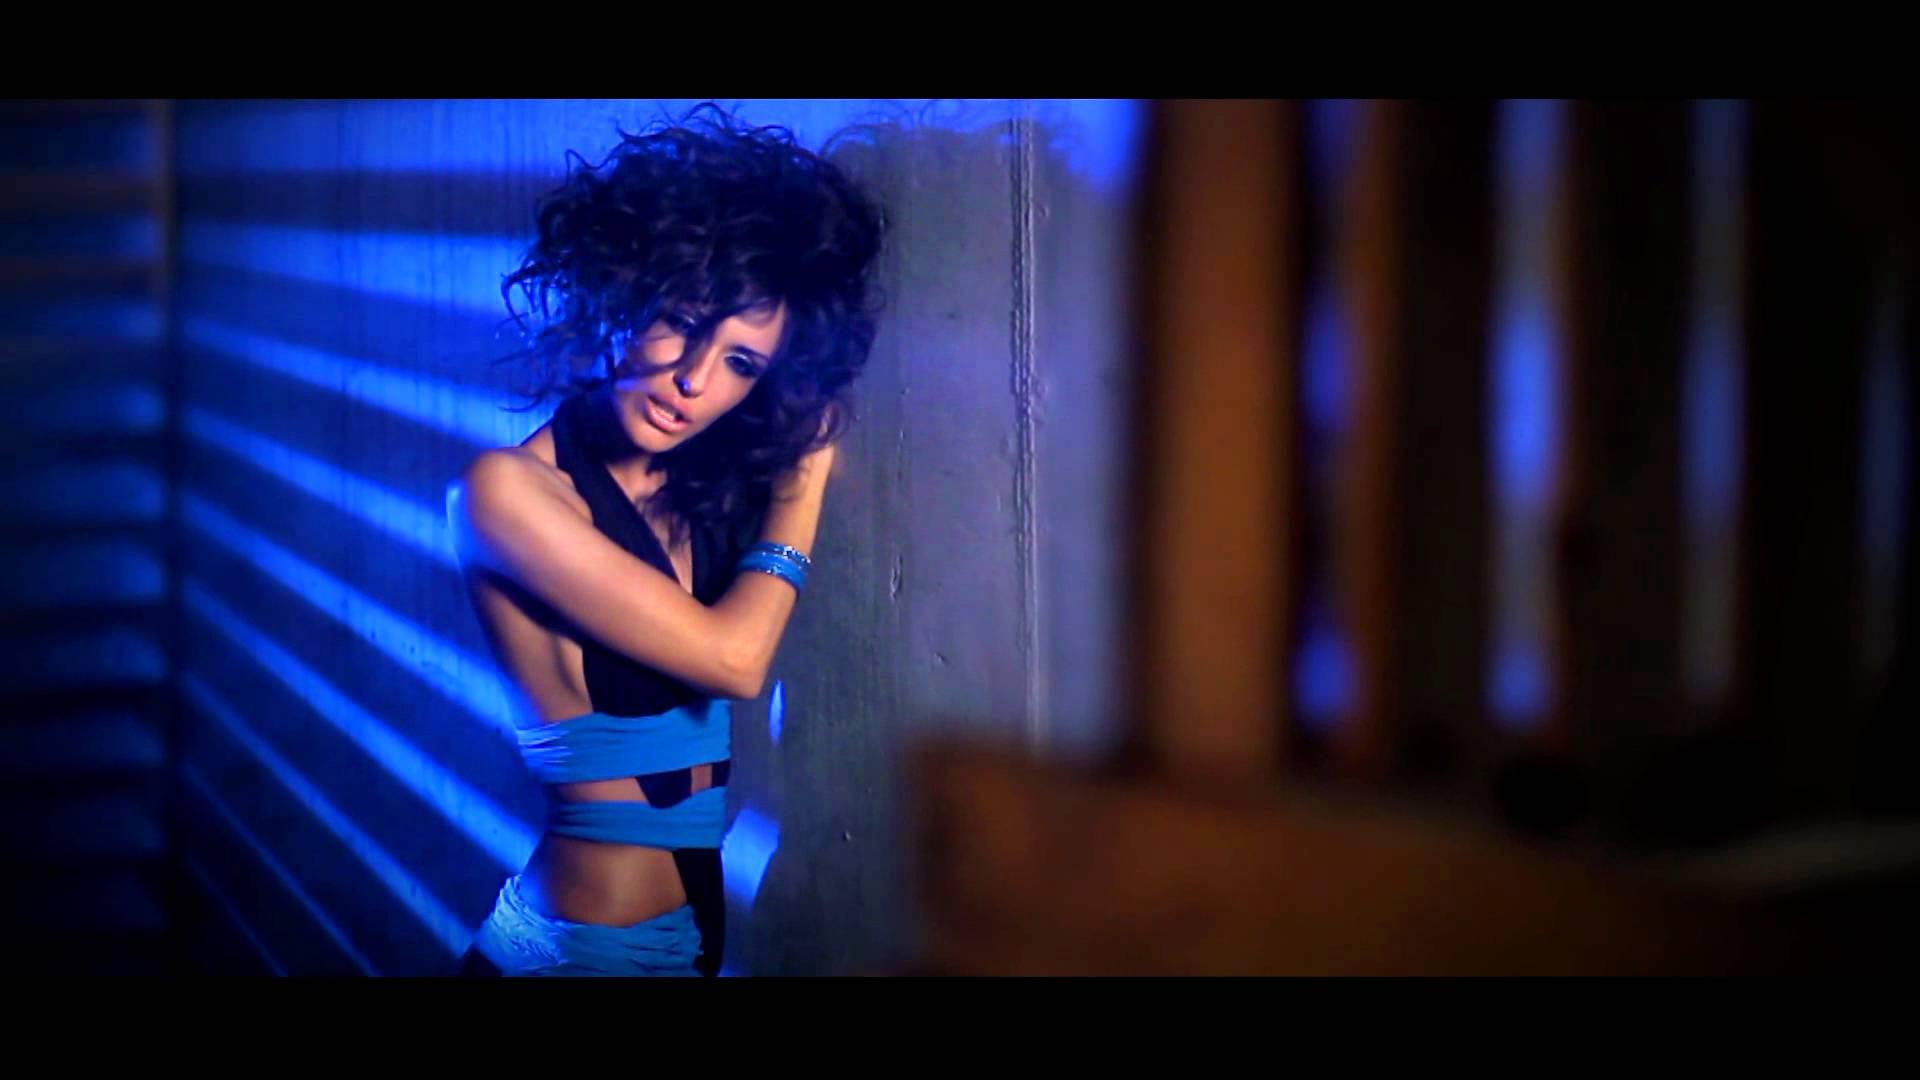 Mihran Tsarukyan feat. Lilit Hovhannisyan – Inchu em qez sirum